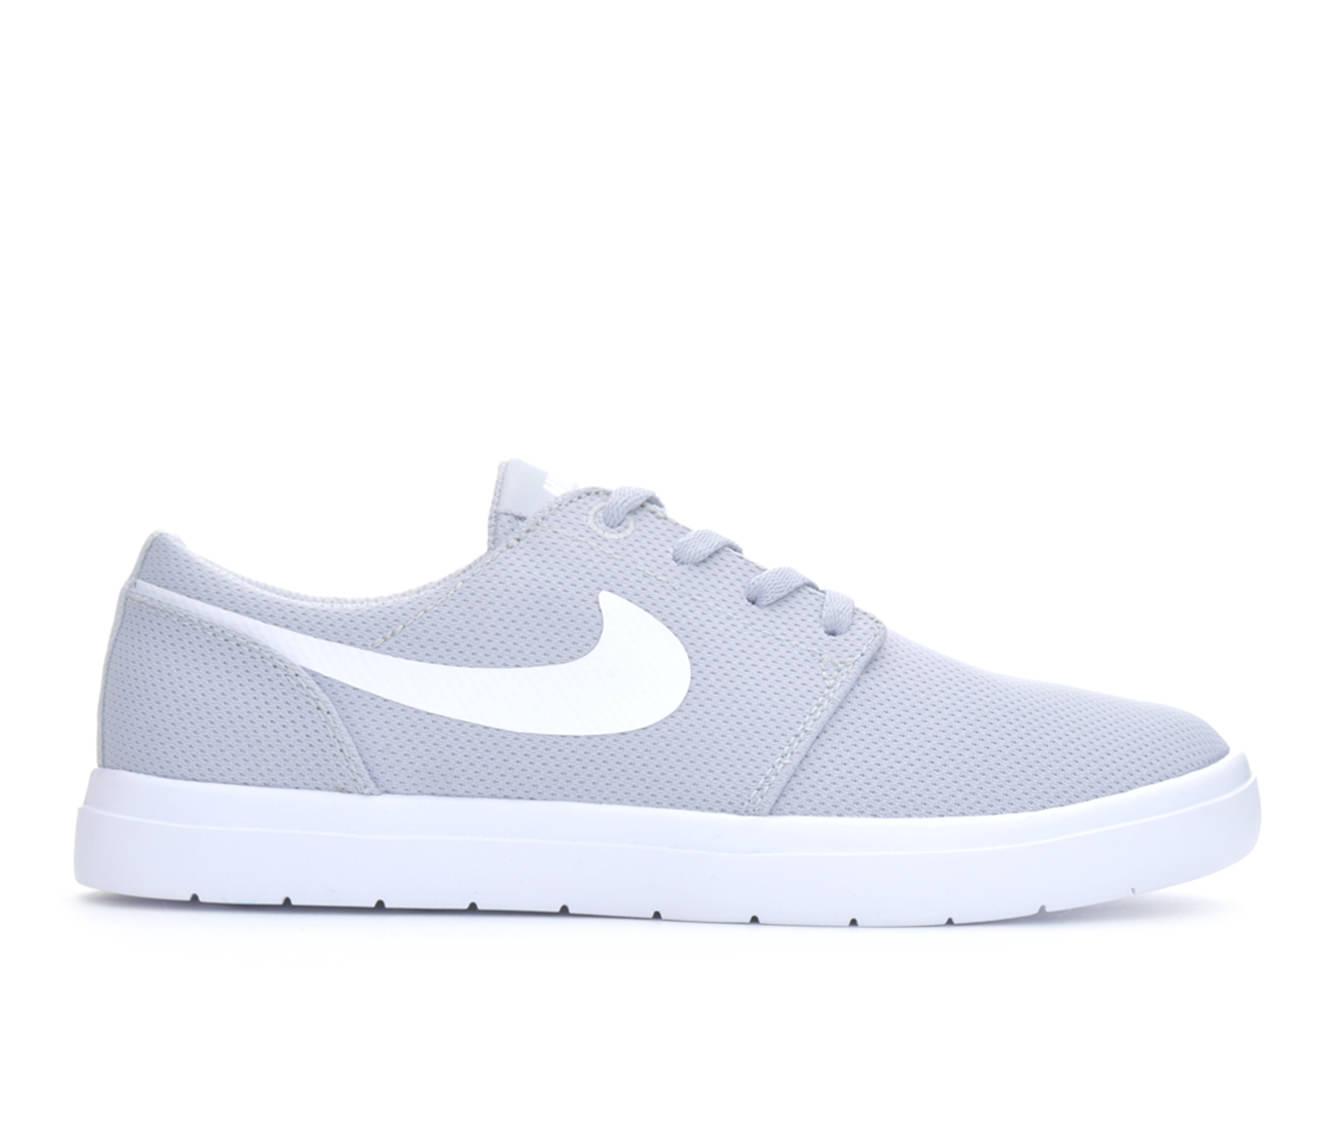 Boys' Nike Portmore II Ultralight Skate Shoes (Green)